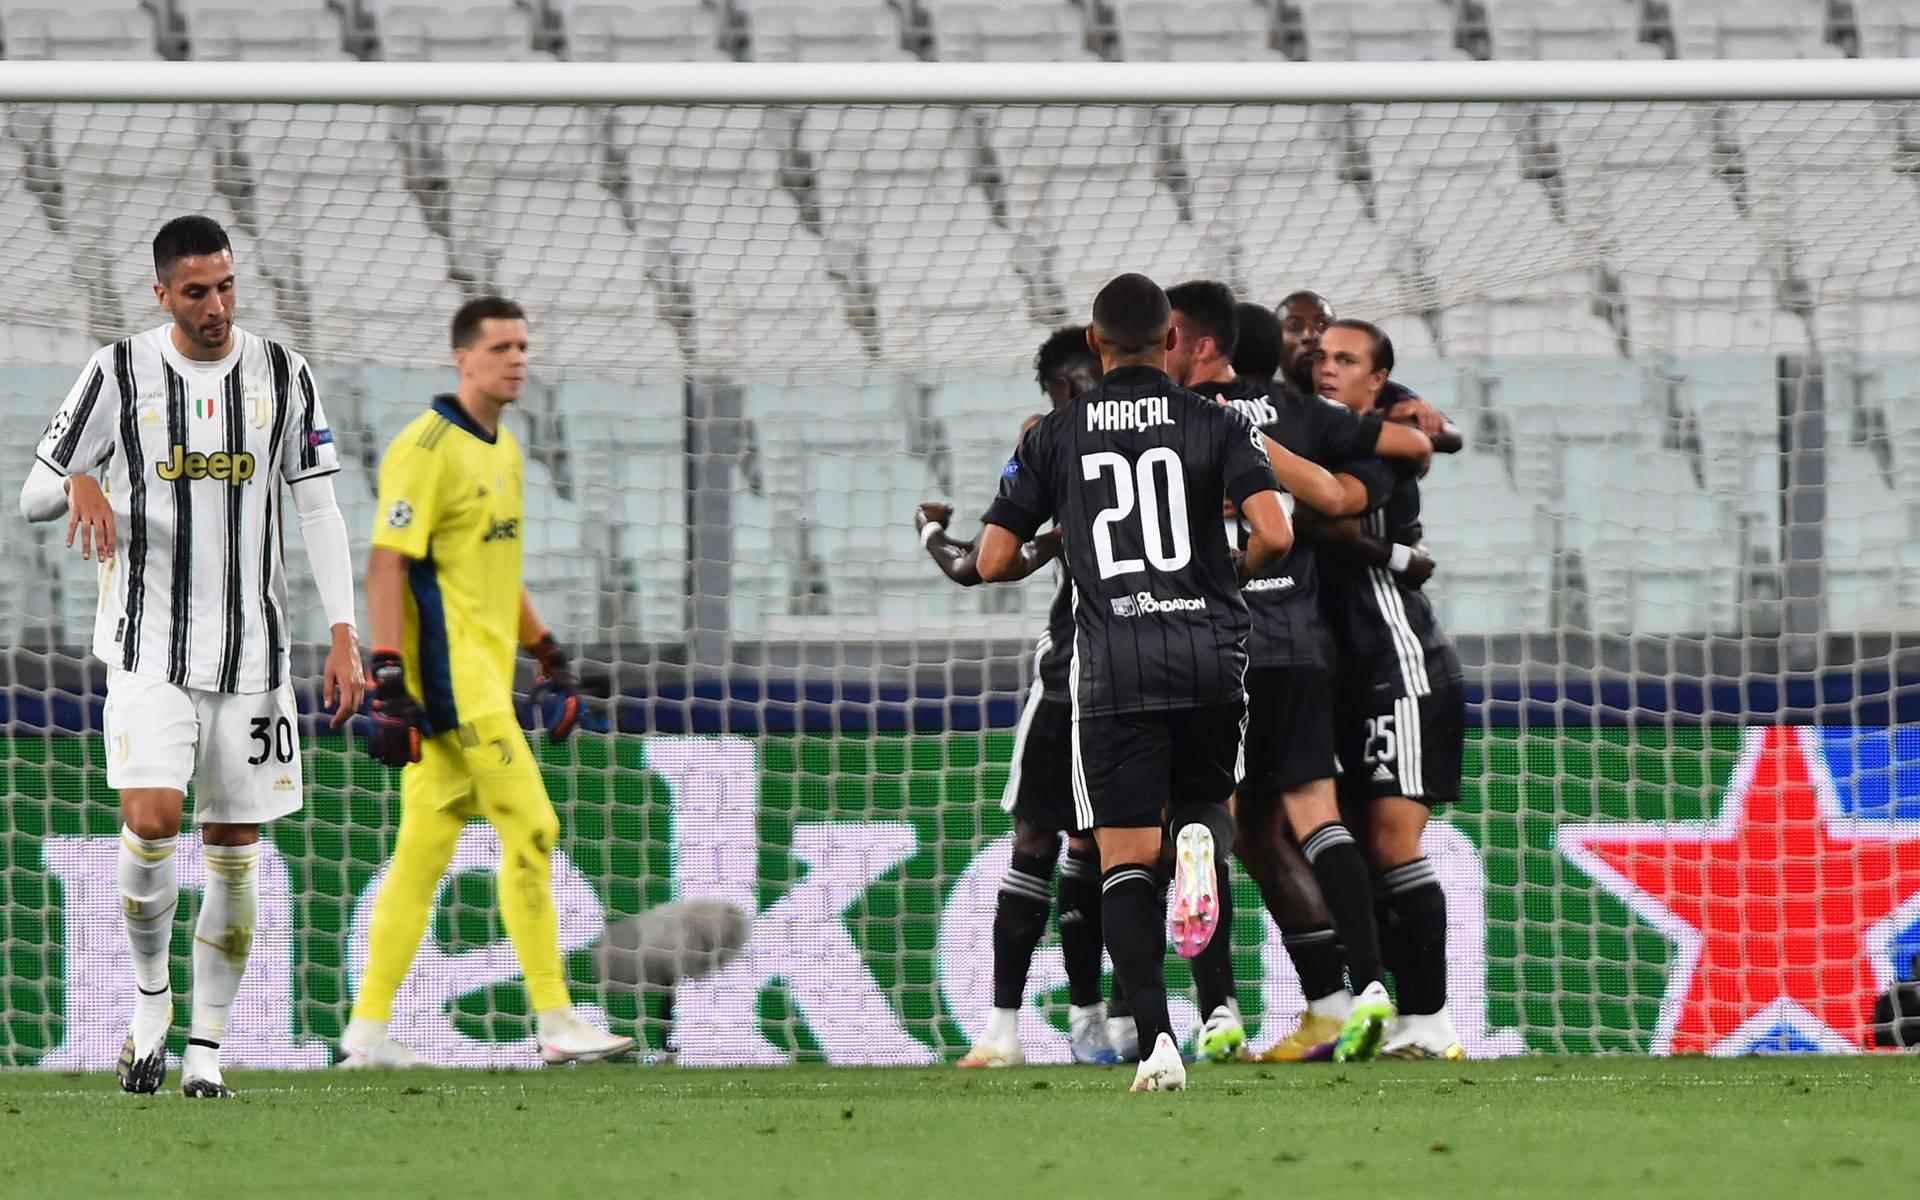 Champions League - Round of 16 Second Leg - Juventus v Olympique Lyonnais